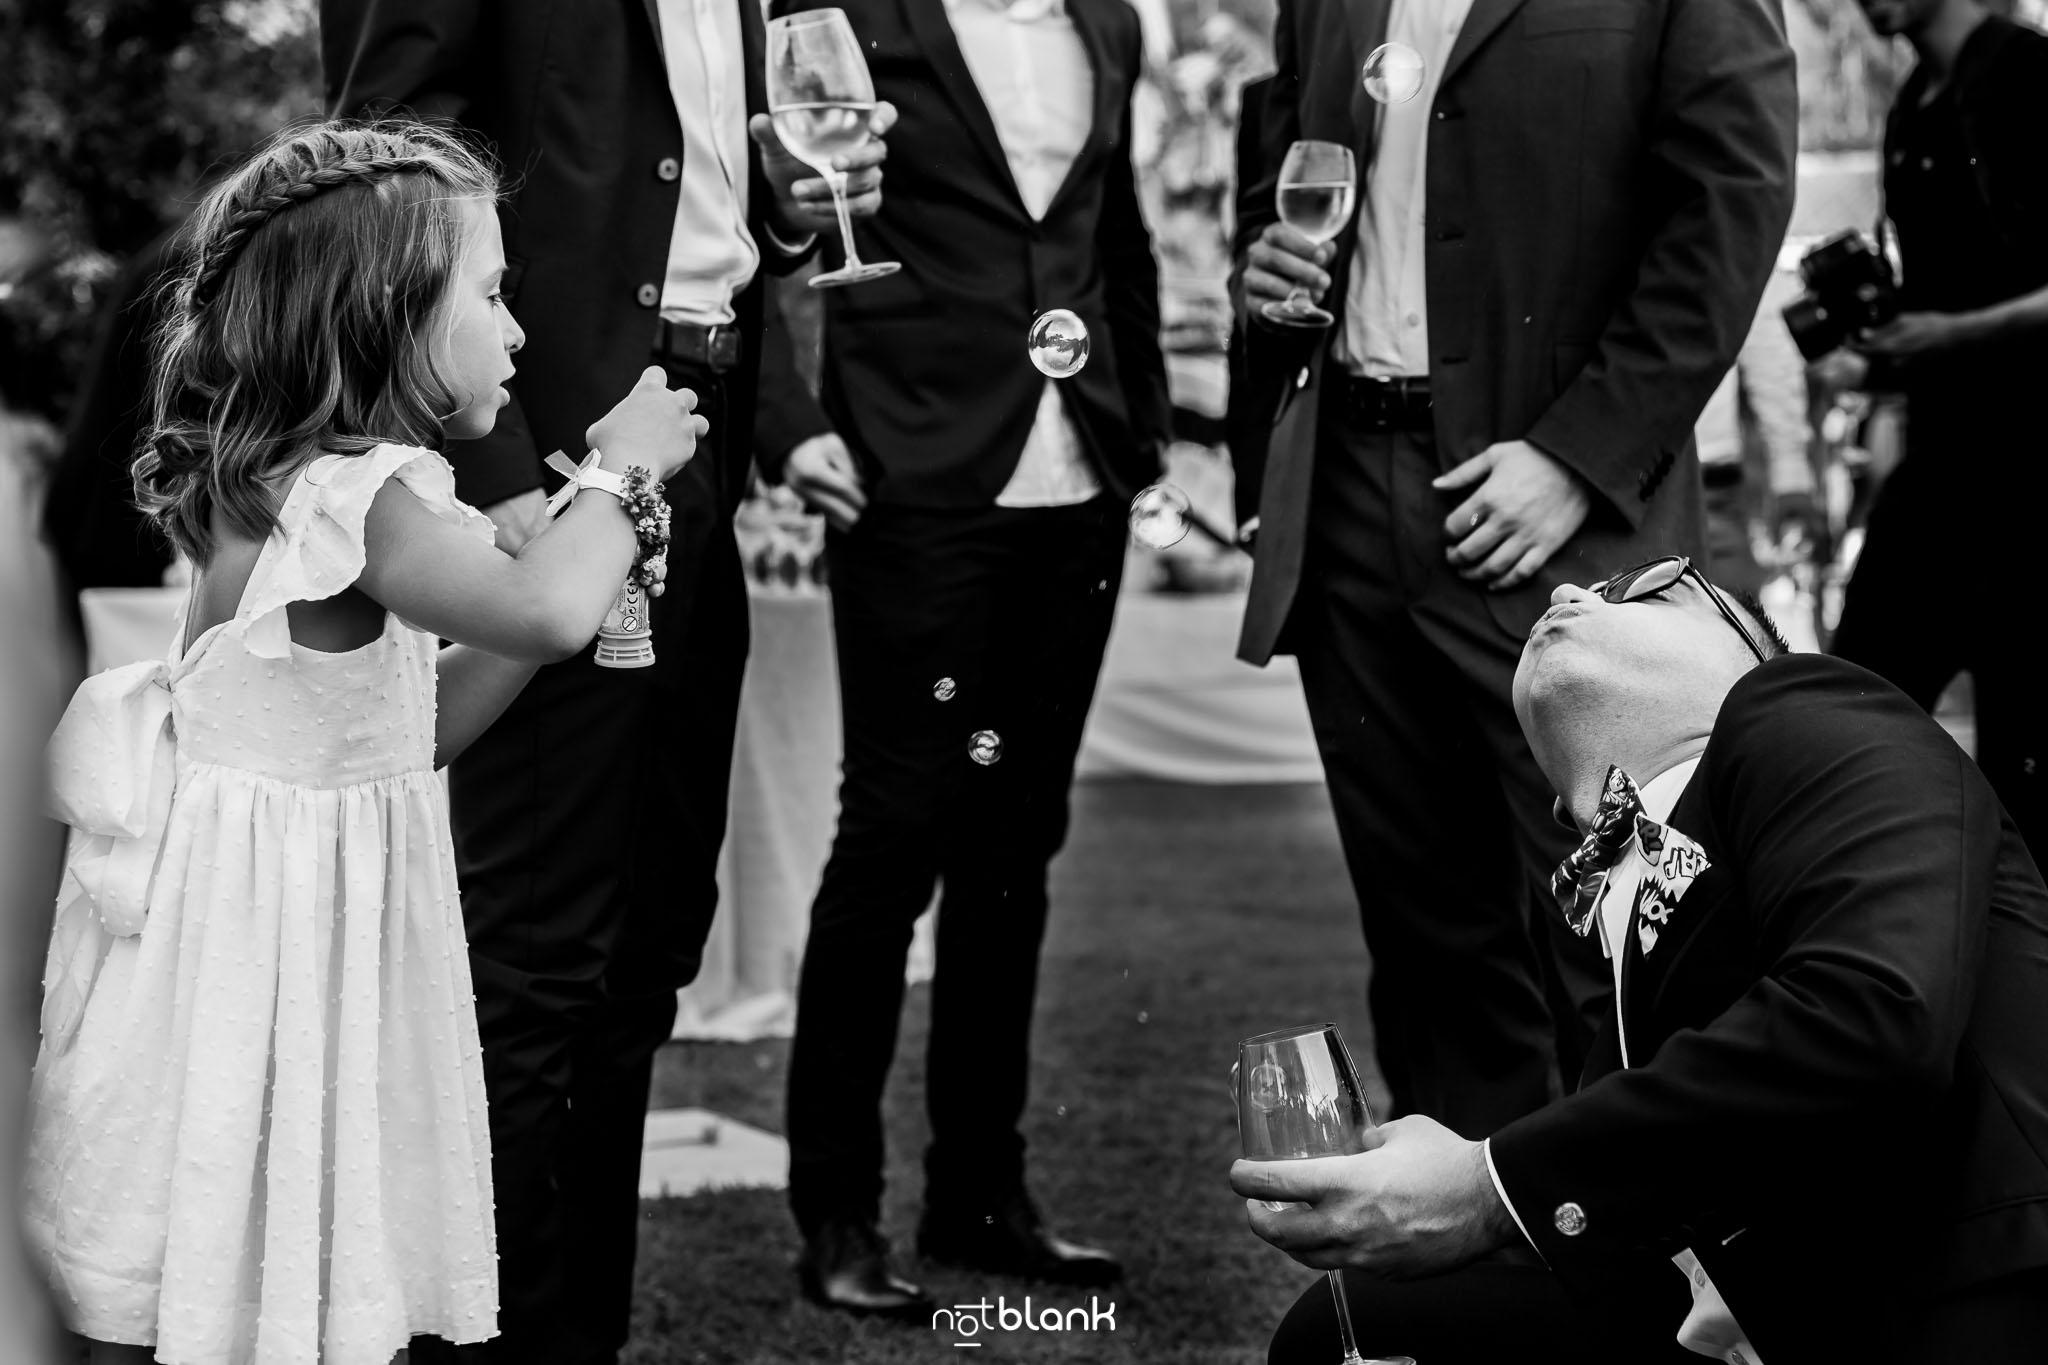 Notblank-Boda Tematica-Star Wars-Malaposta-Portugal-Fotógrafo de boda-Niña-Pompas de jabón